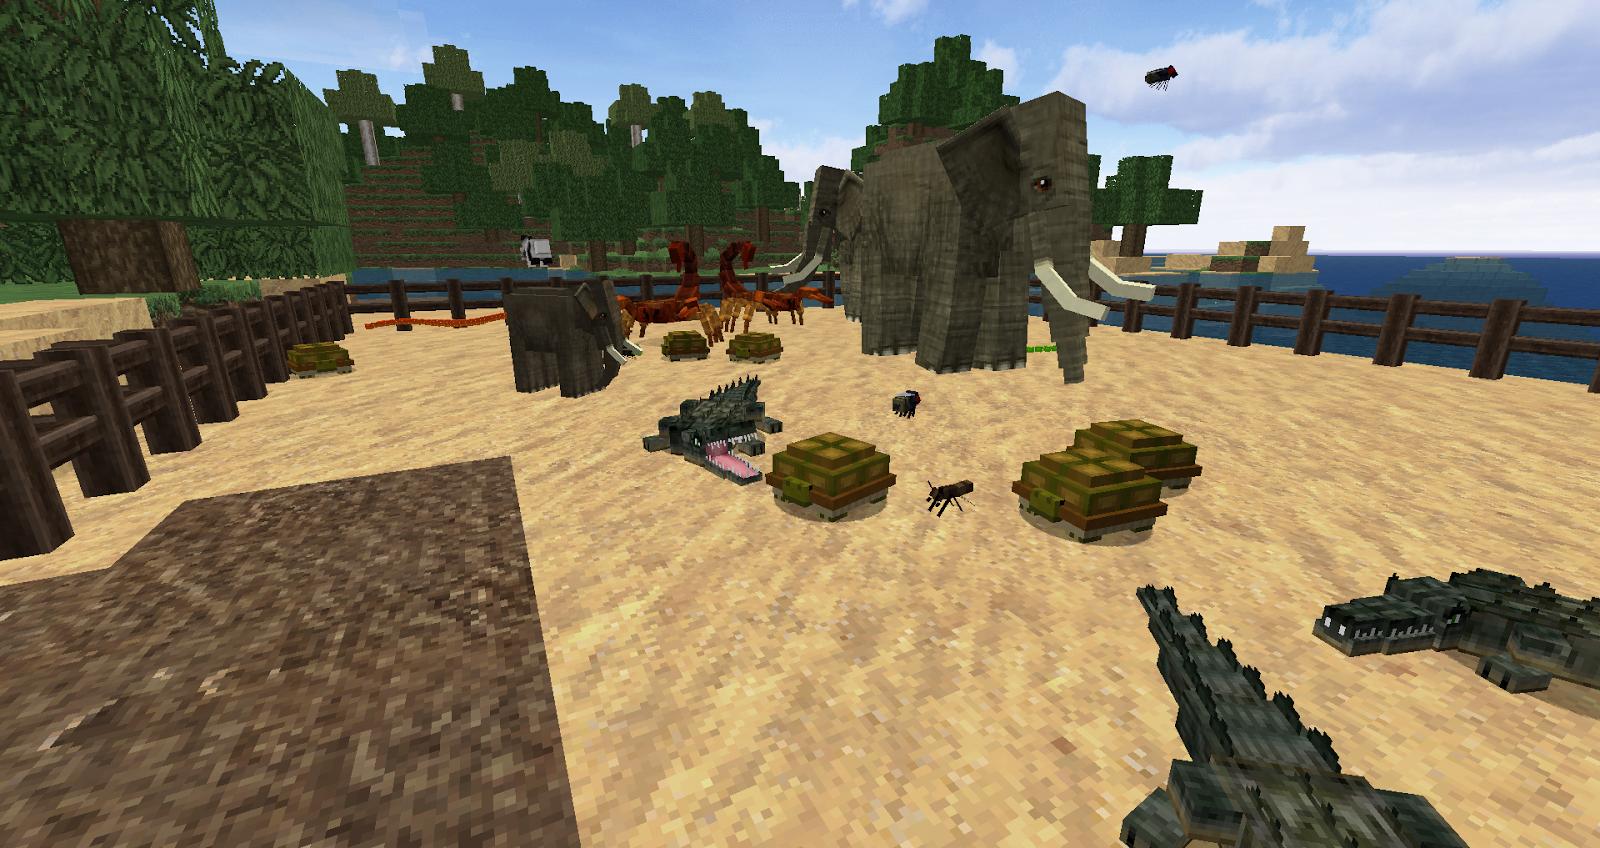 Mo' Creatures Mod para Minecraft 1.7.2, mo creatures, cómo instalar mo creatures, mo creatures 1.7.2, cómo instalar mods, minecraft mods, mods minecraft, descargar mods, mods para minecraft